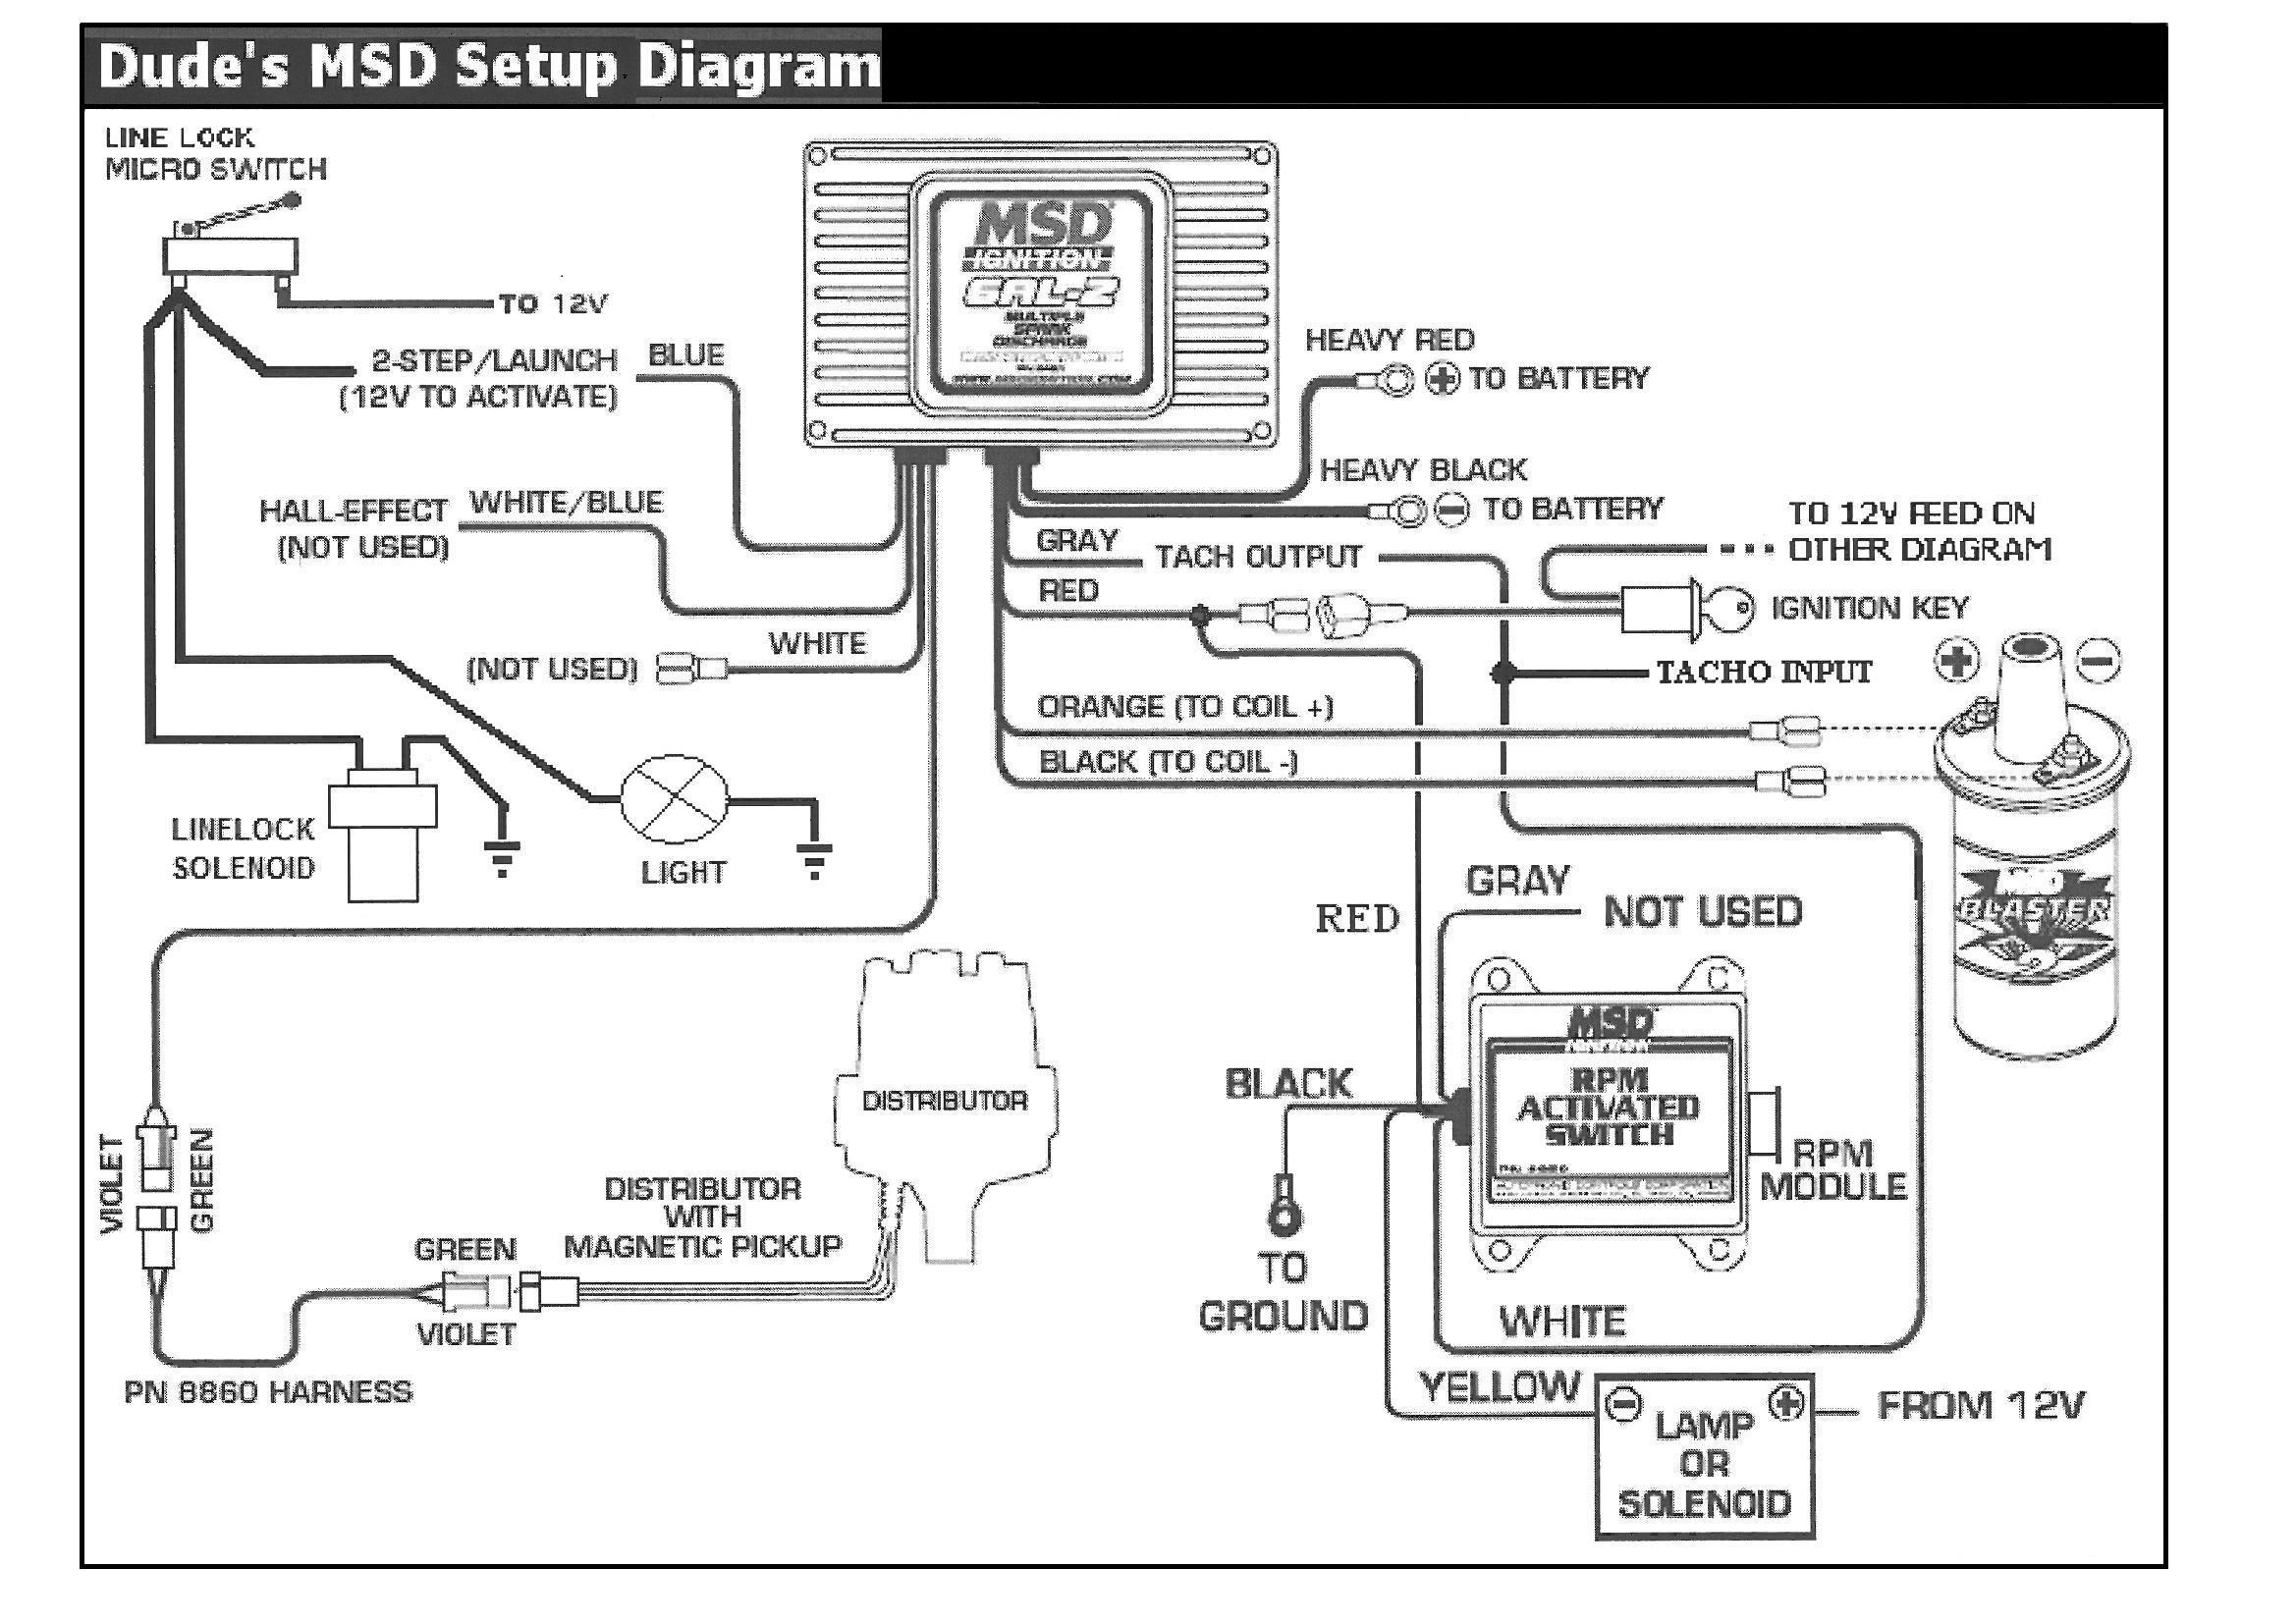 tel tac ii wiring diagram tel tac oval track pro wiring